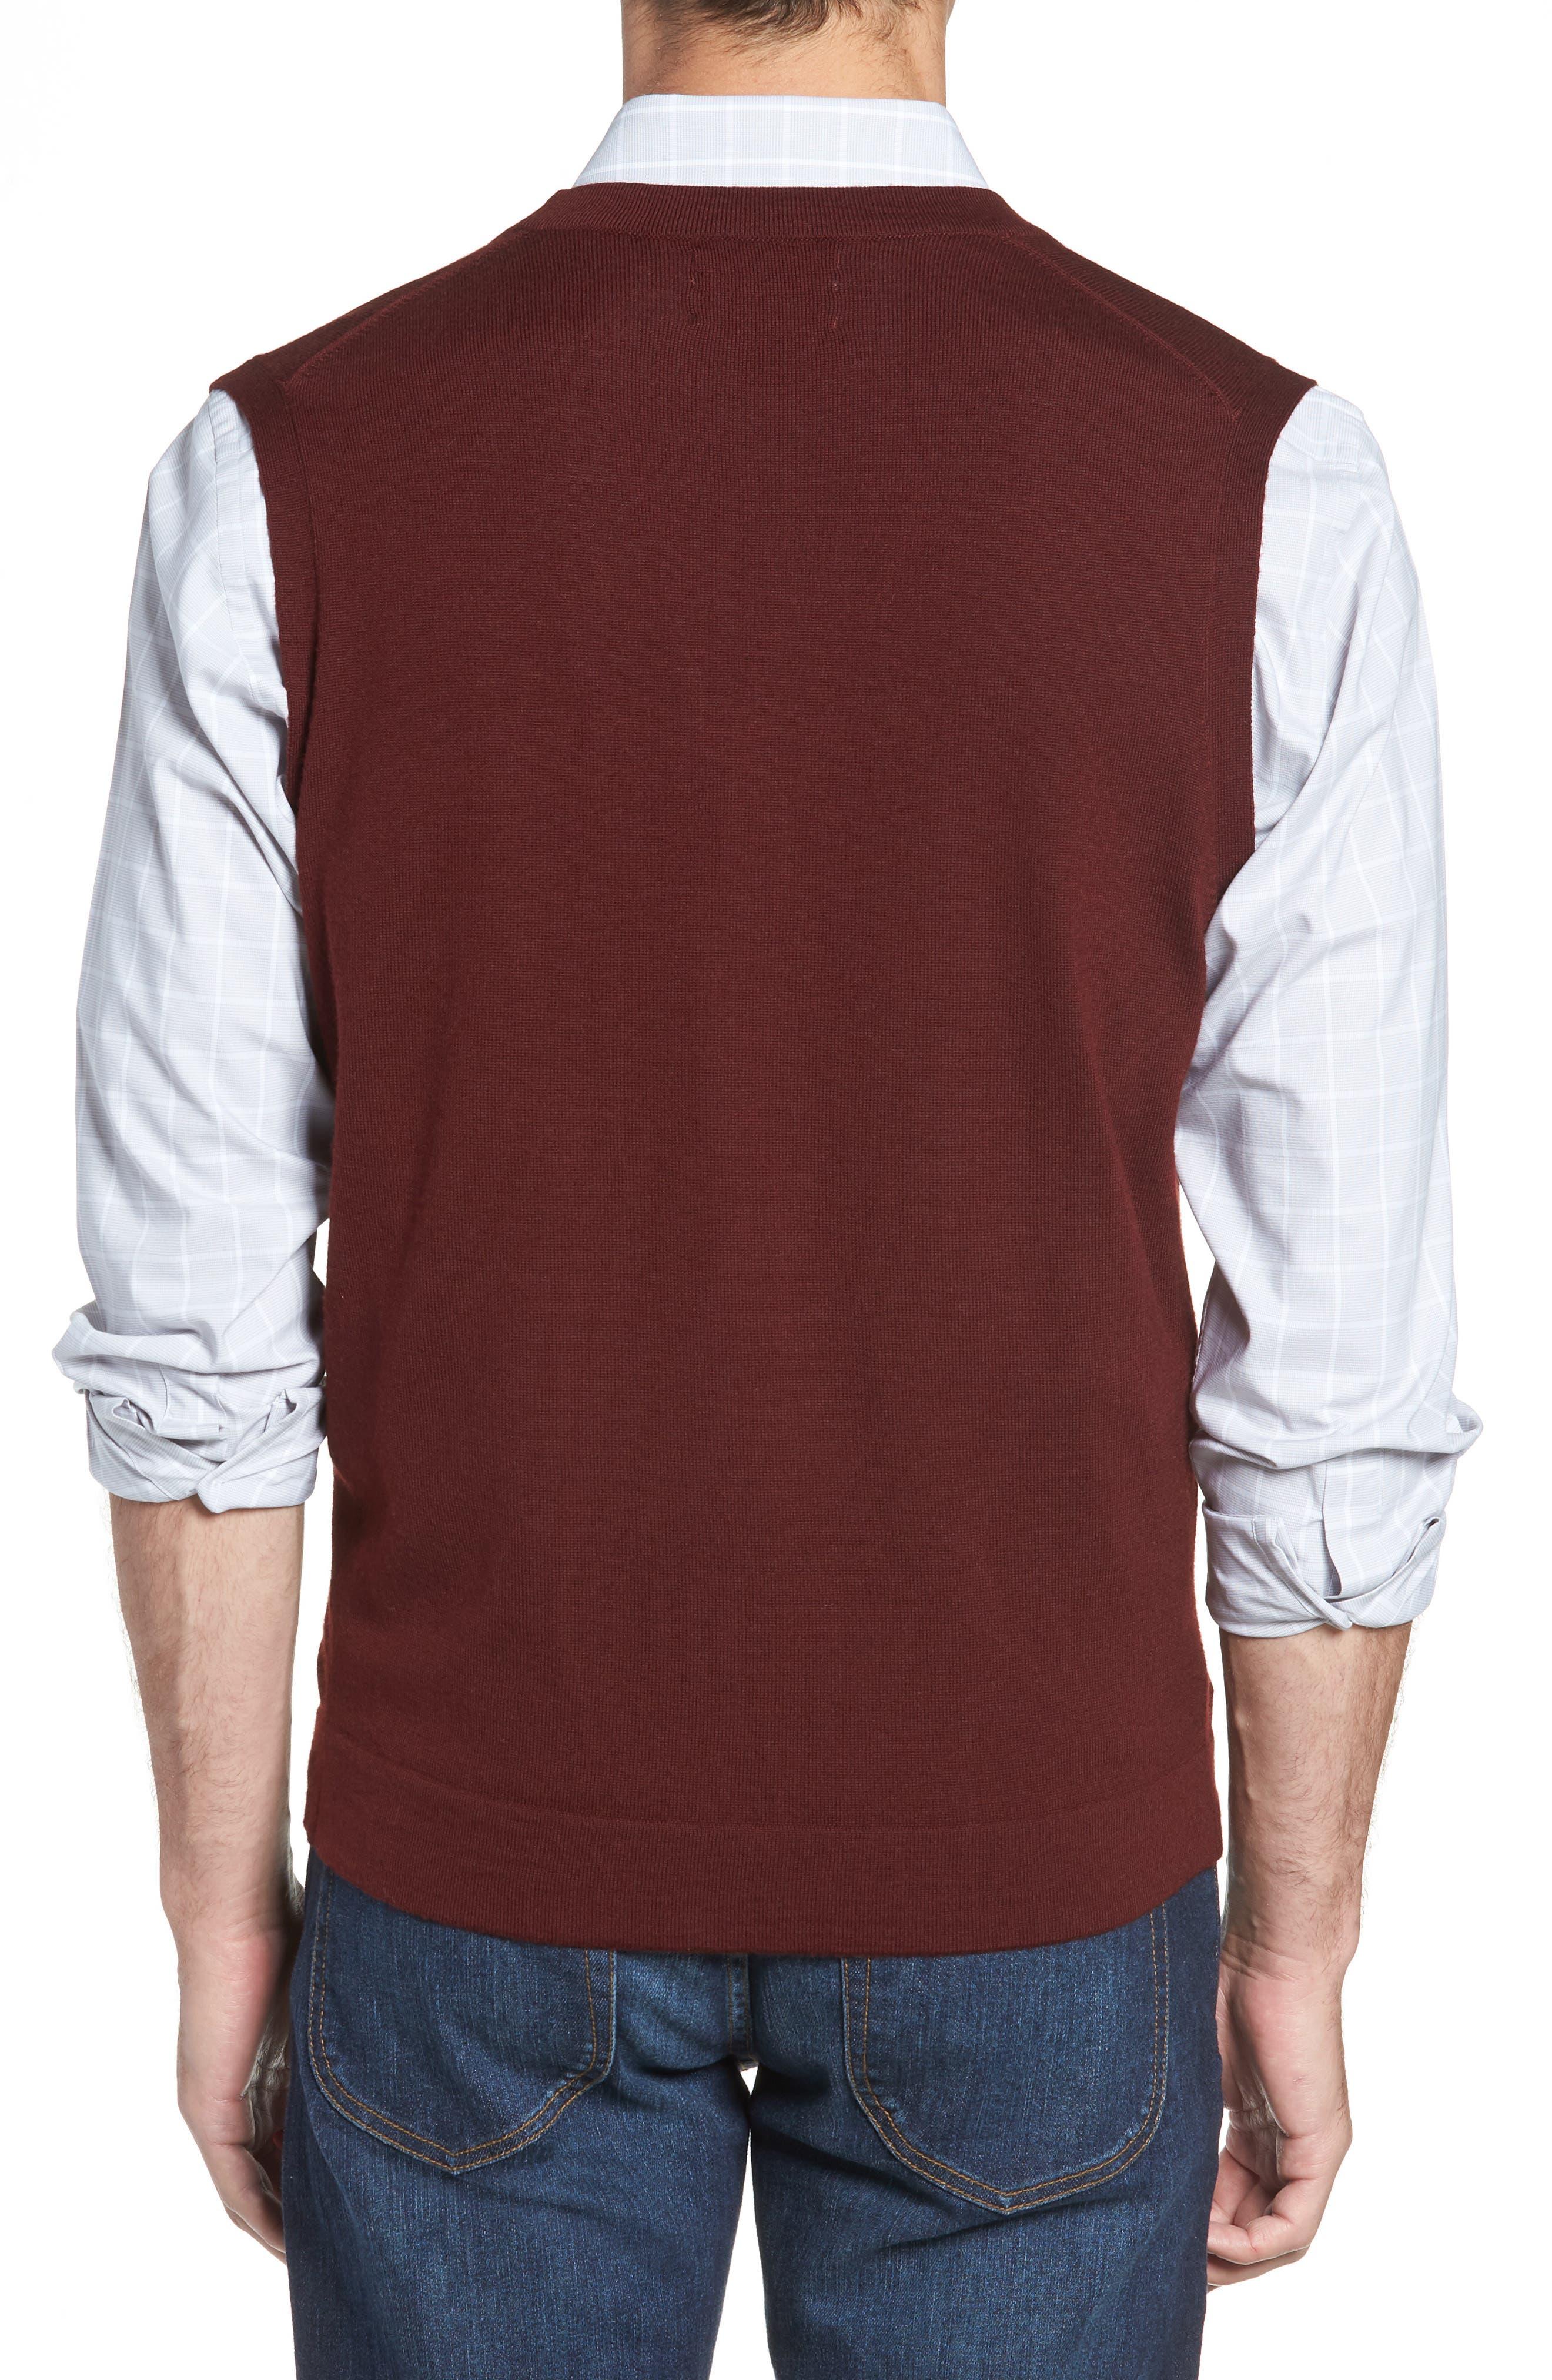 Merino Button Front Sweater Vest,                             Alternate thumbnail 2, color,                             Burgundy Royale